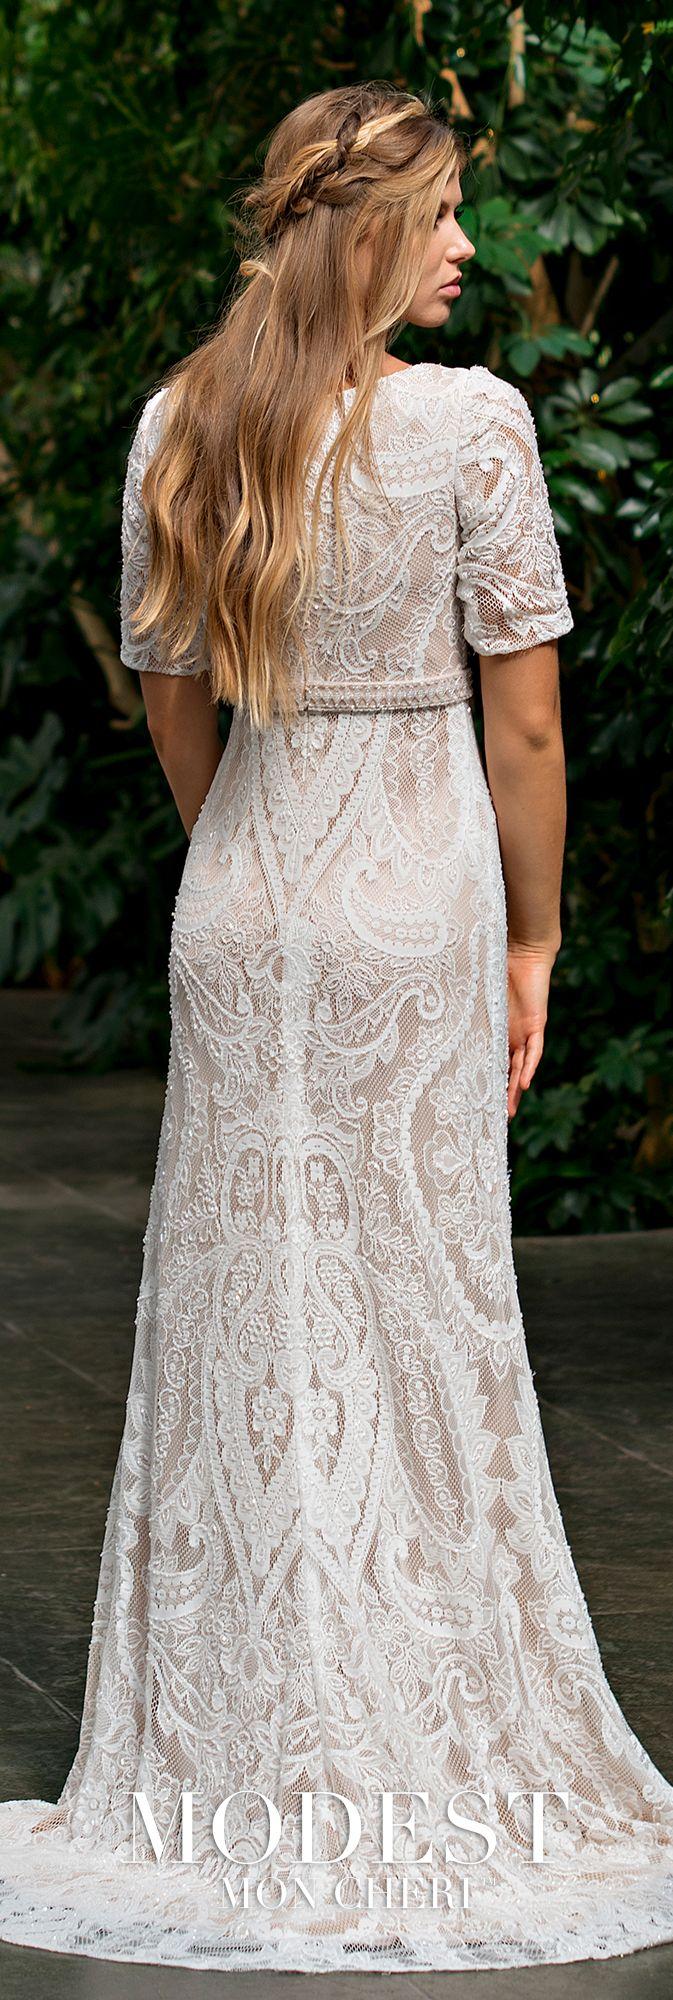 Modest wedding dresses tr modest wedding lace design and